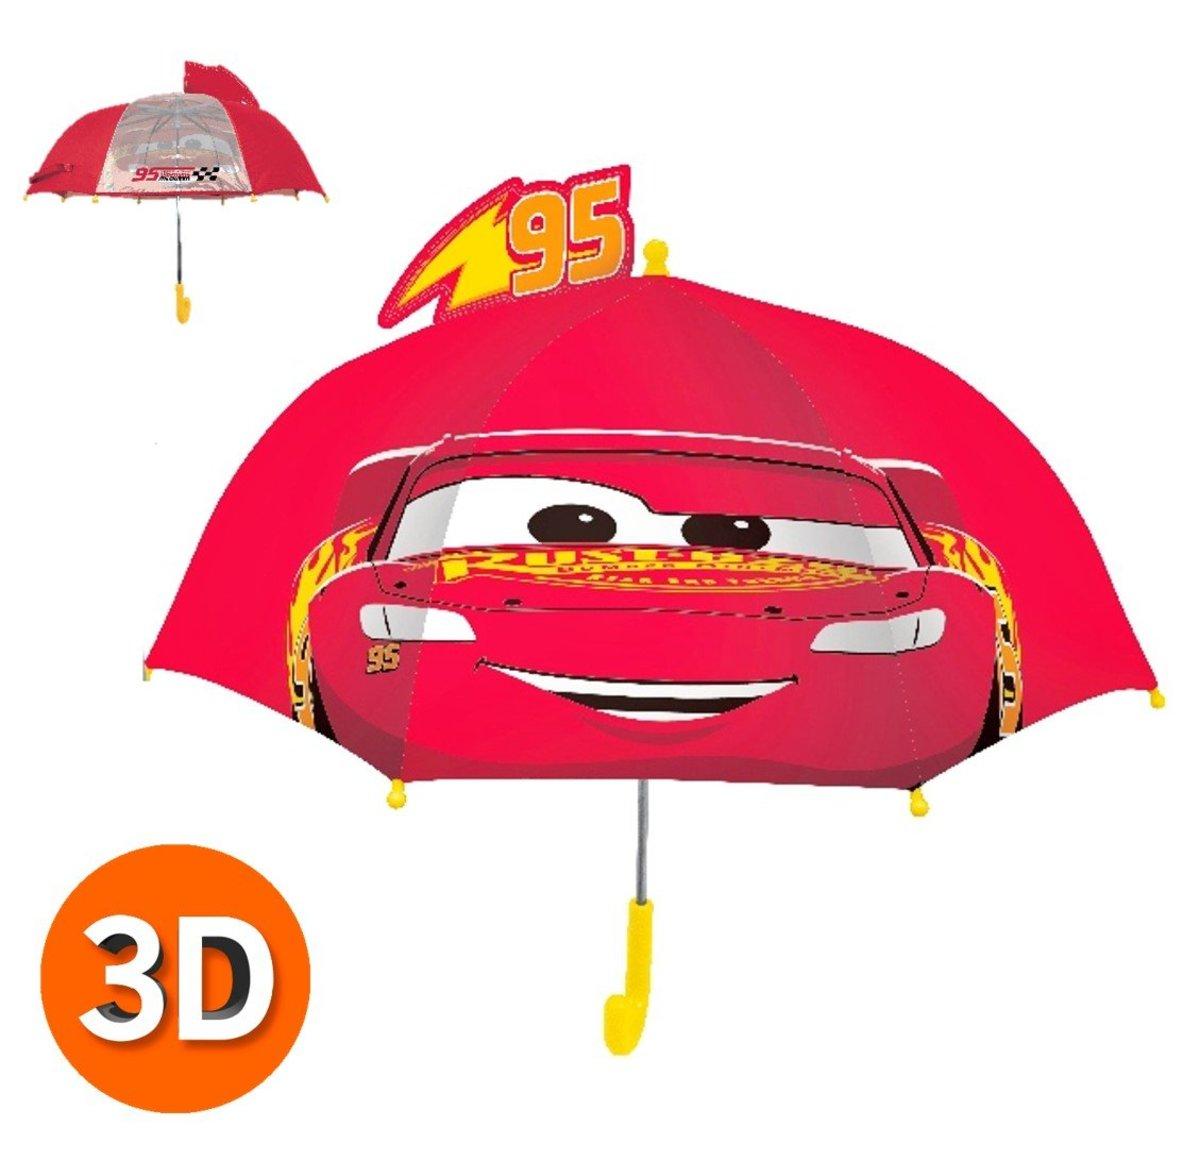 3D Umbrella B (Licensed by Disney)